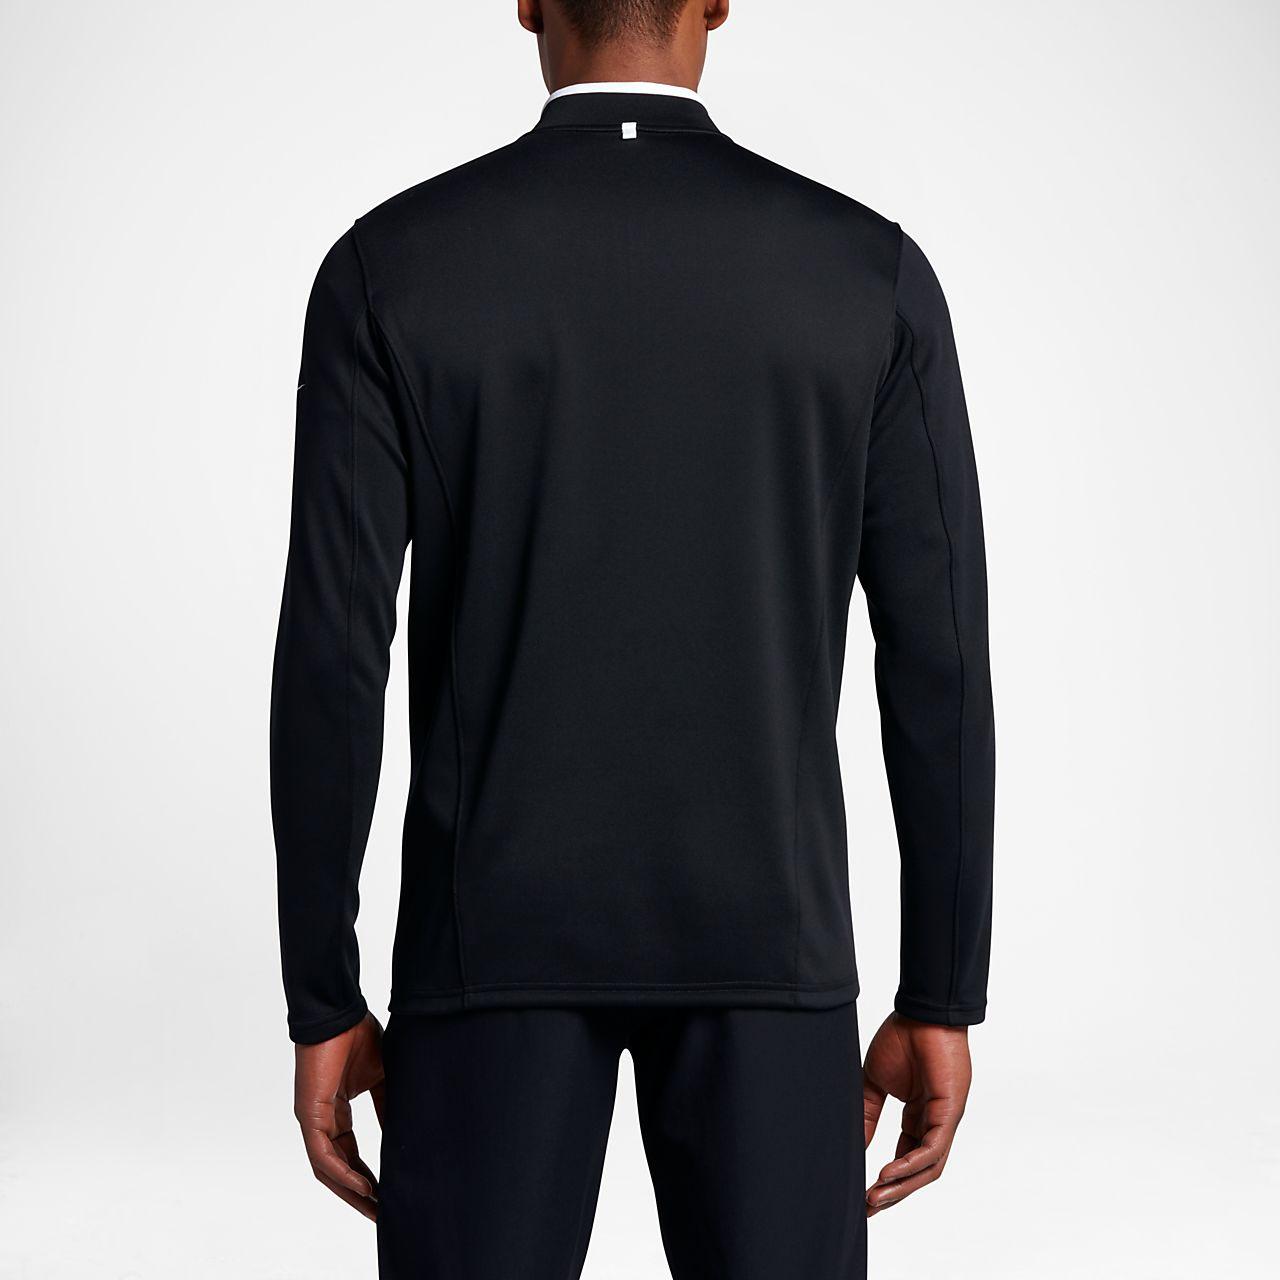 ... Nike Dri-FIT Half-Zip Men's Long-Sleeve Golf Top